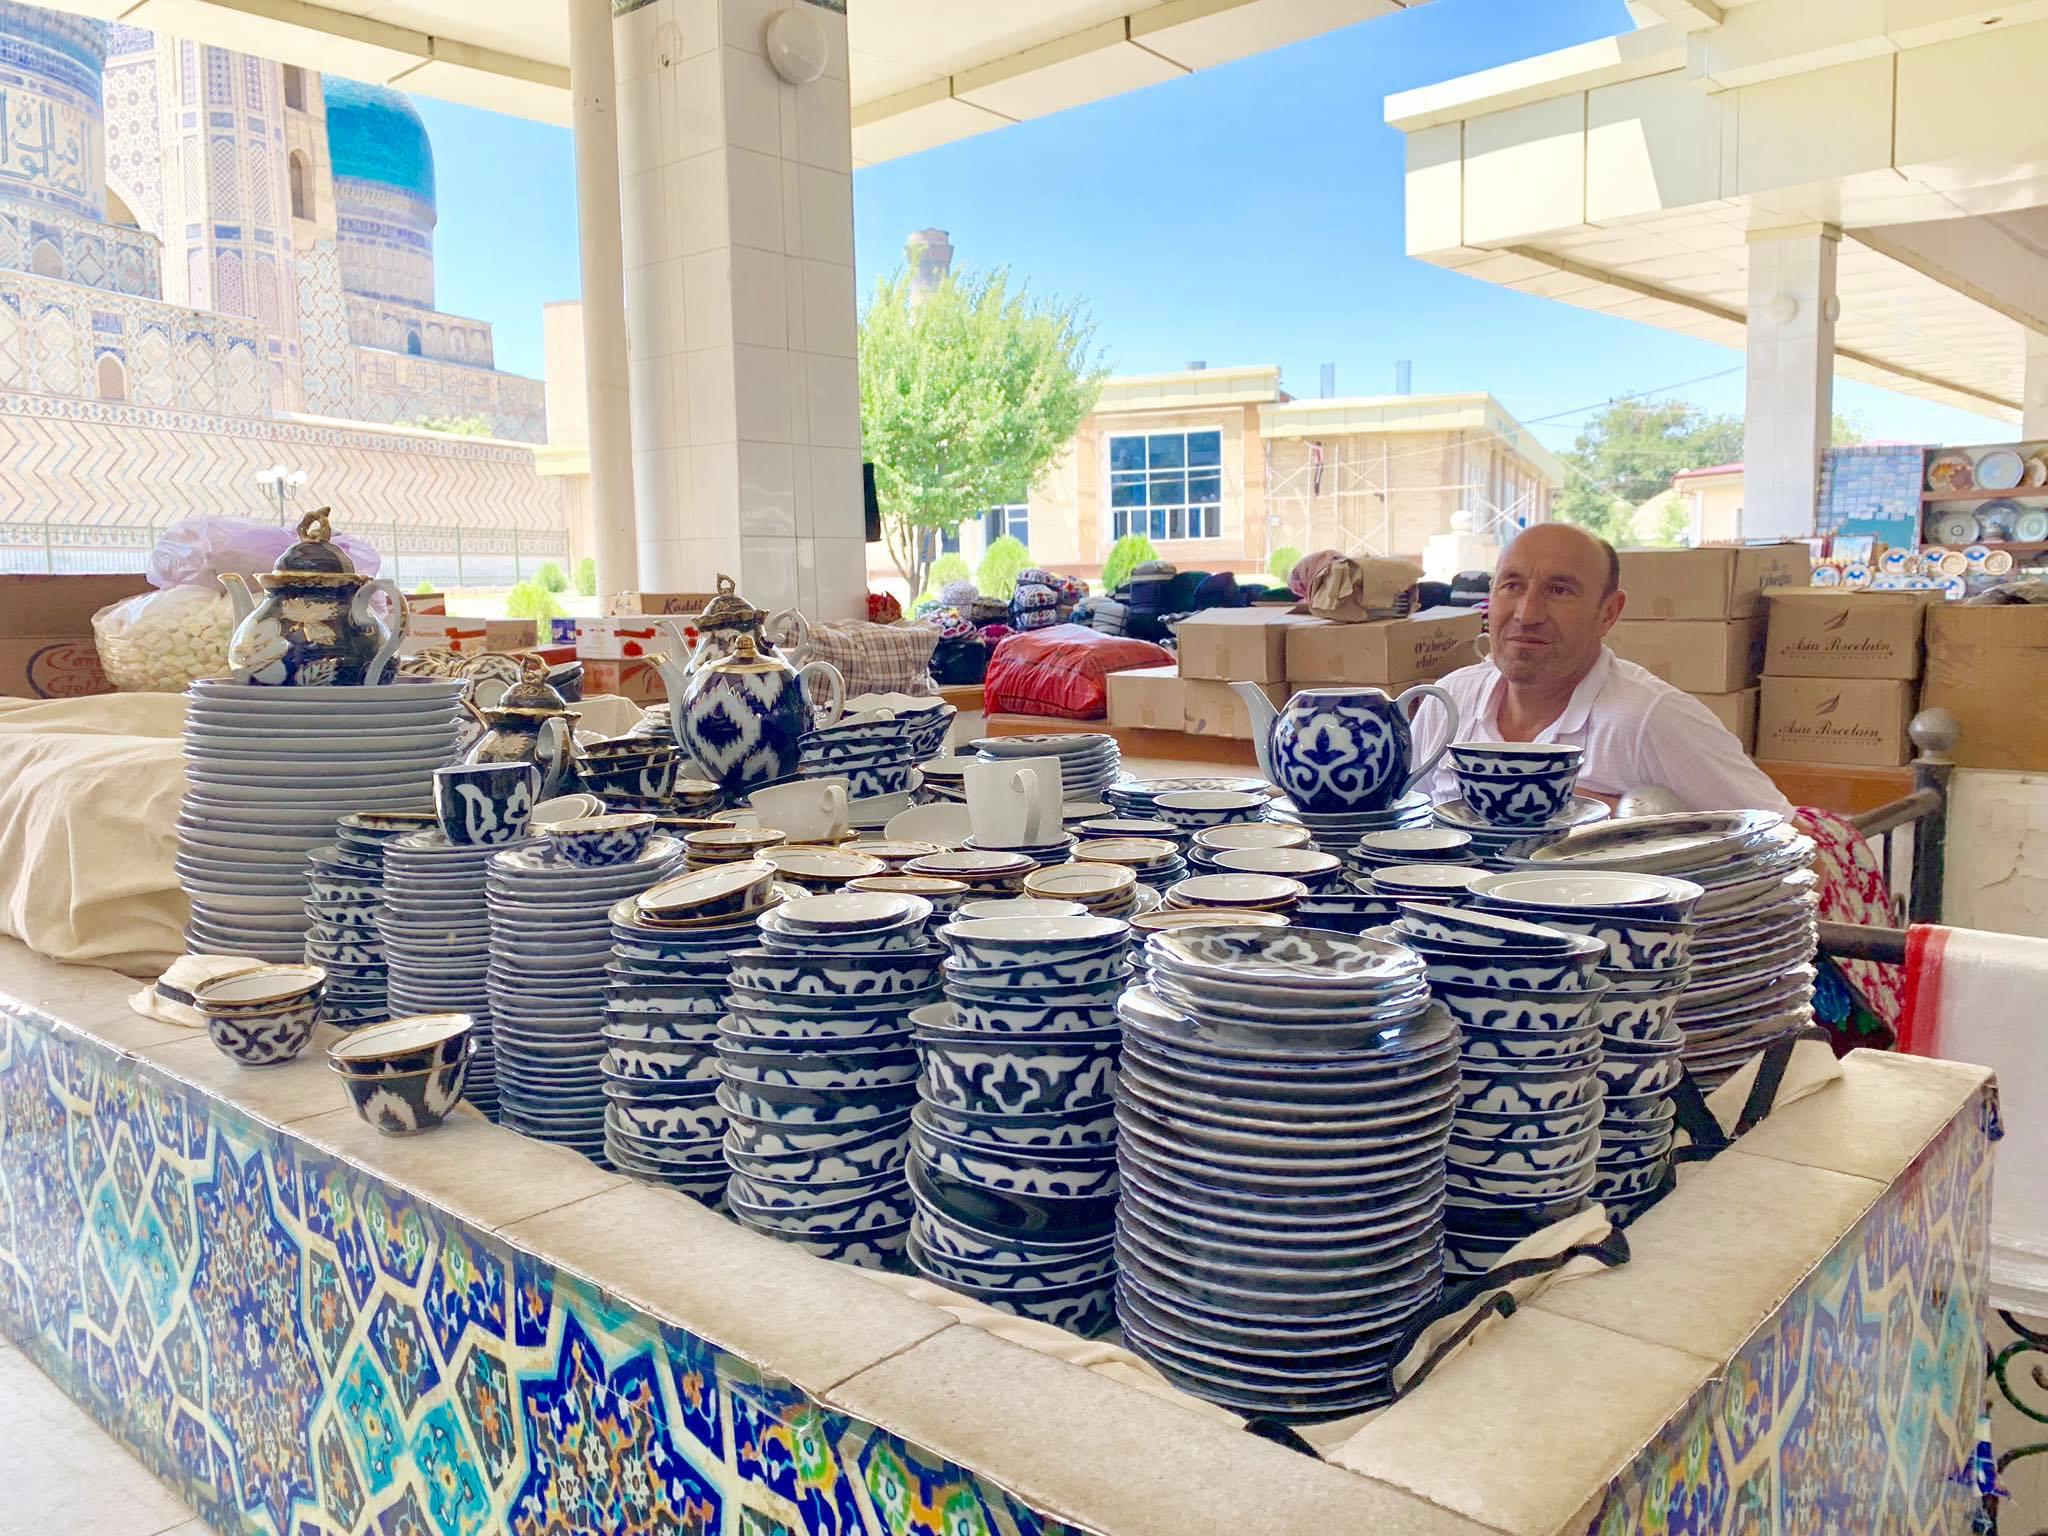 Kach Solo Travels in 2019 Siyab Bazaar and Registan on my first day in Samarkand26.jpg